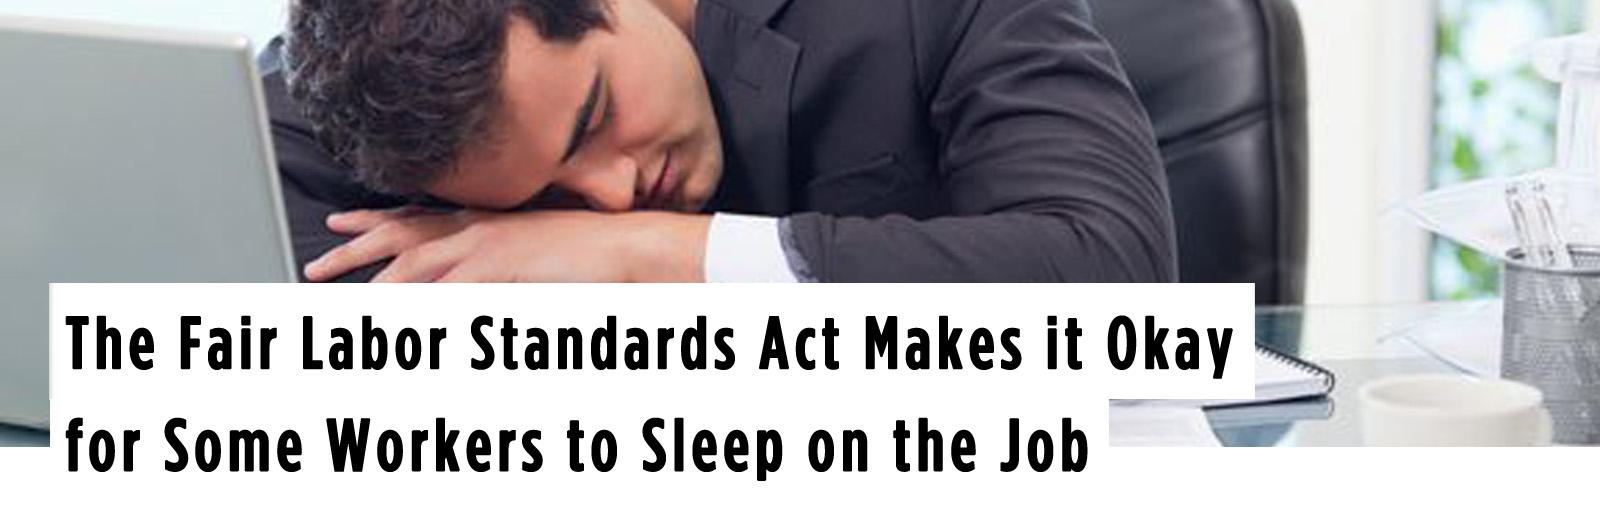 Sleep on the job BANNER.jpg